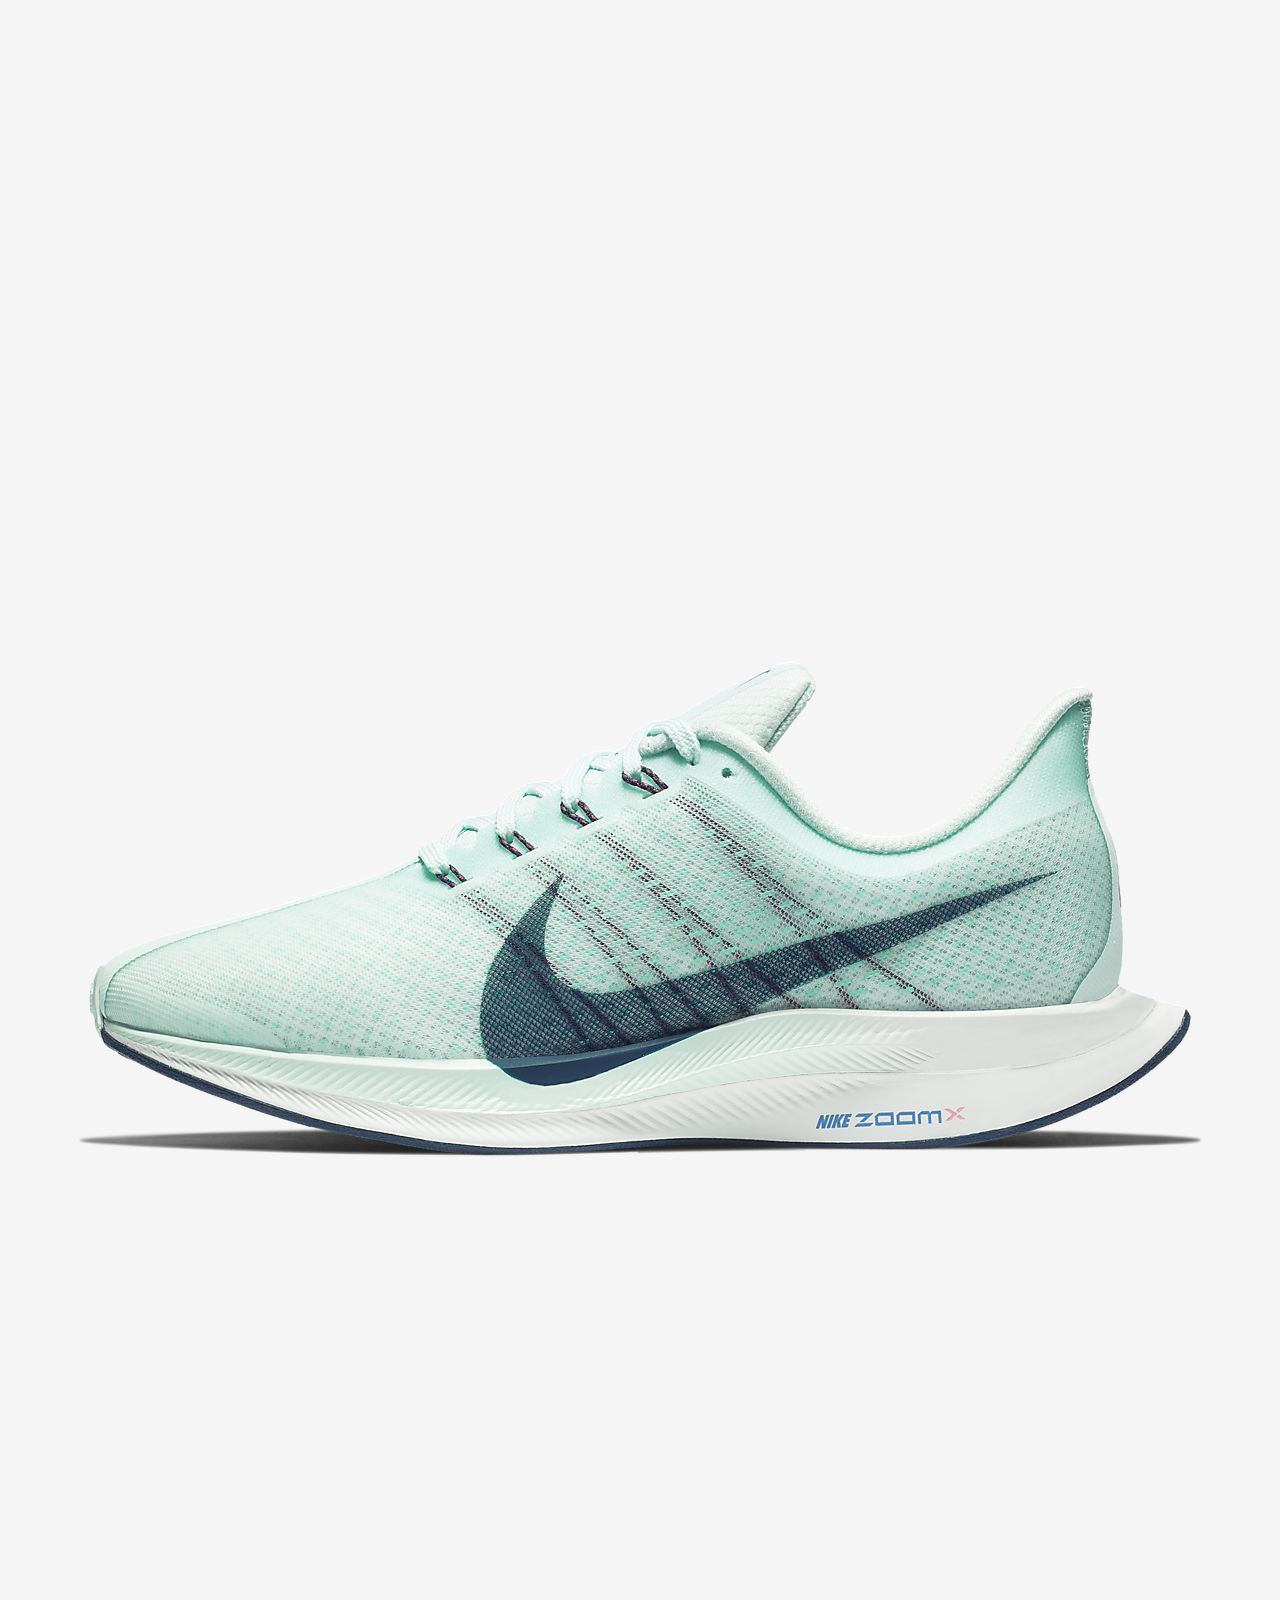 Nike Zoom Pegasus Turbo Hardloopschoen voor dames